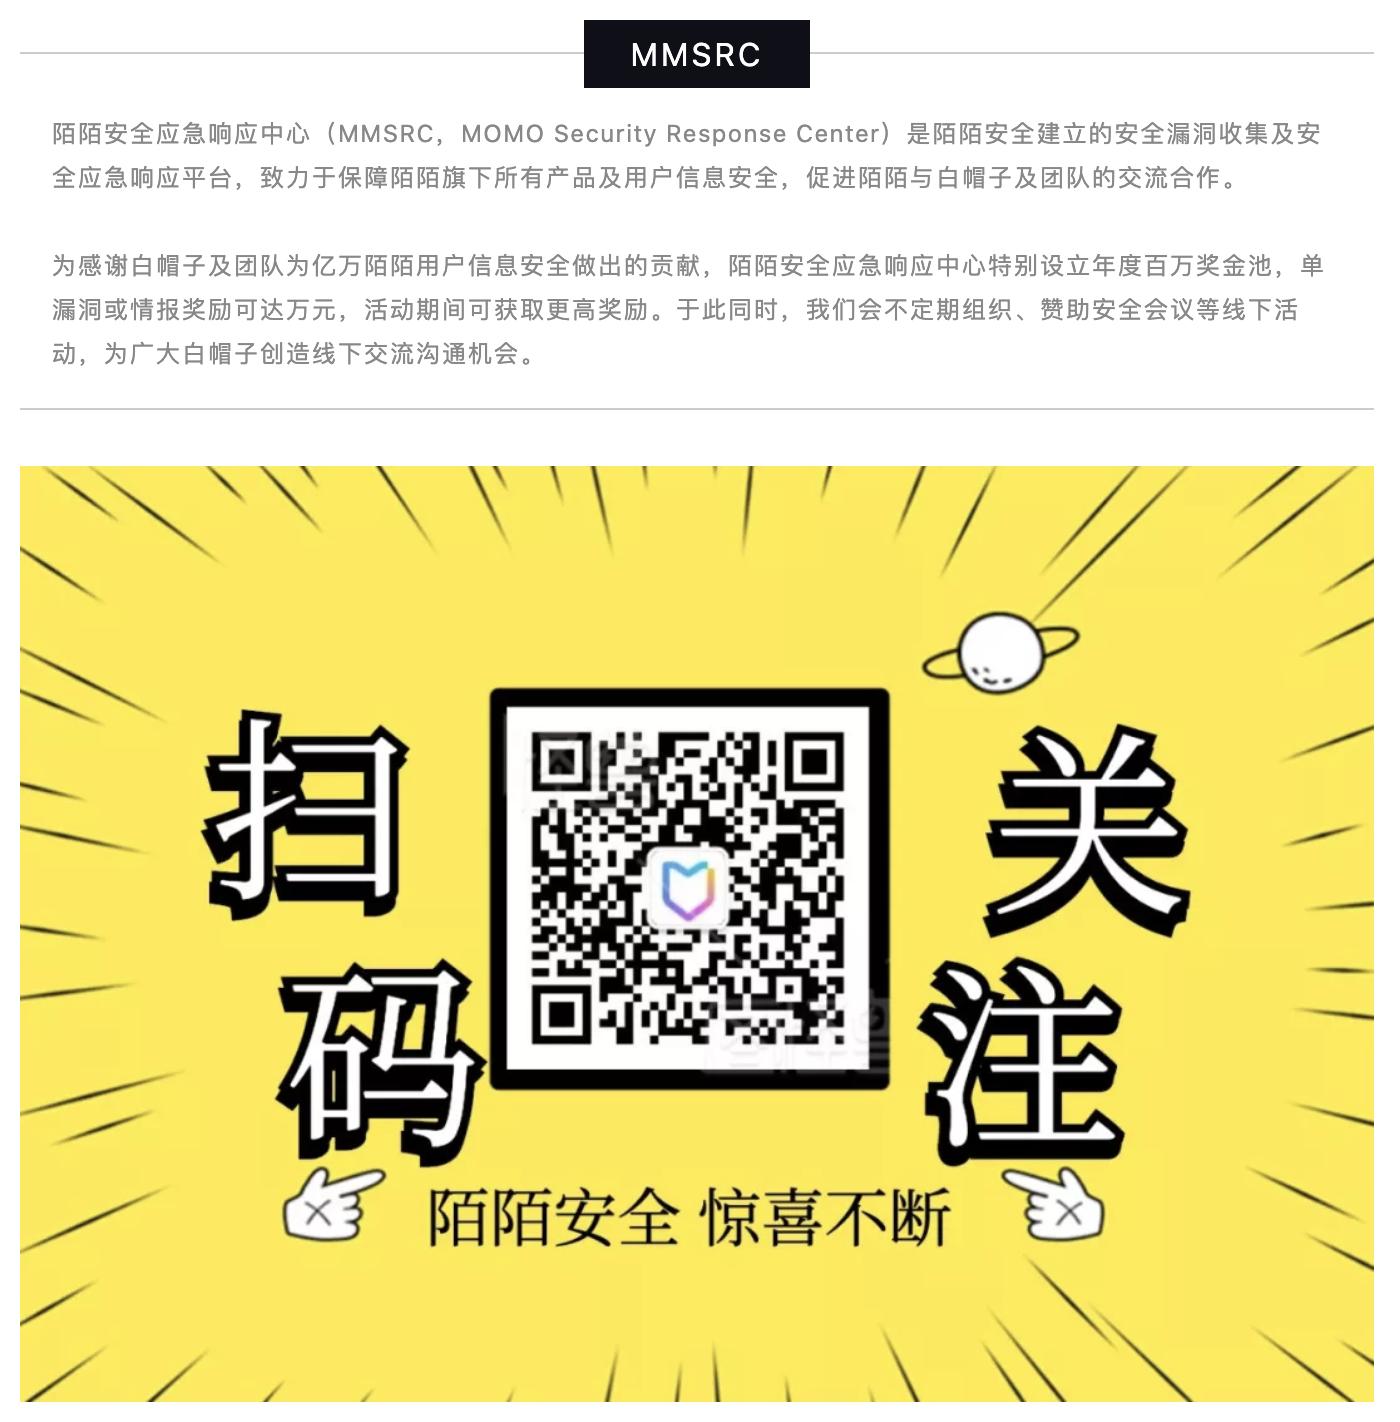 https://momo-mmsrc.oss-cn-hangzhou.aliyuncs.com/img-0971a669-f918-311d-ae63-f3f50e0cd27c.png